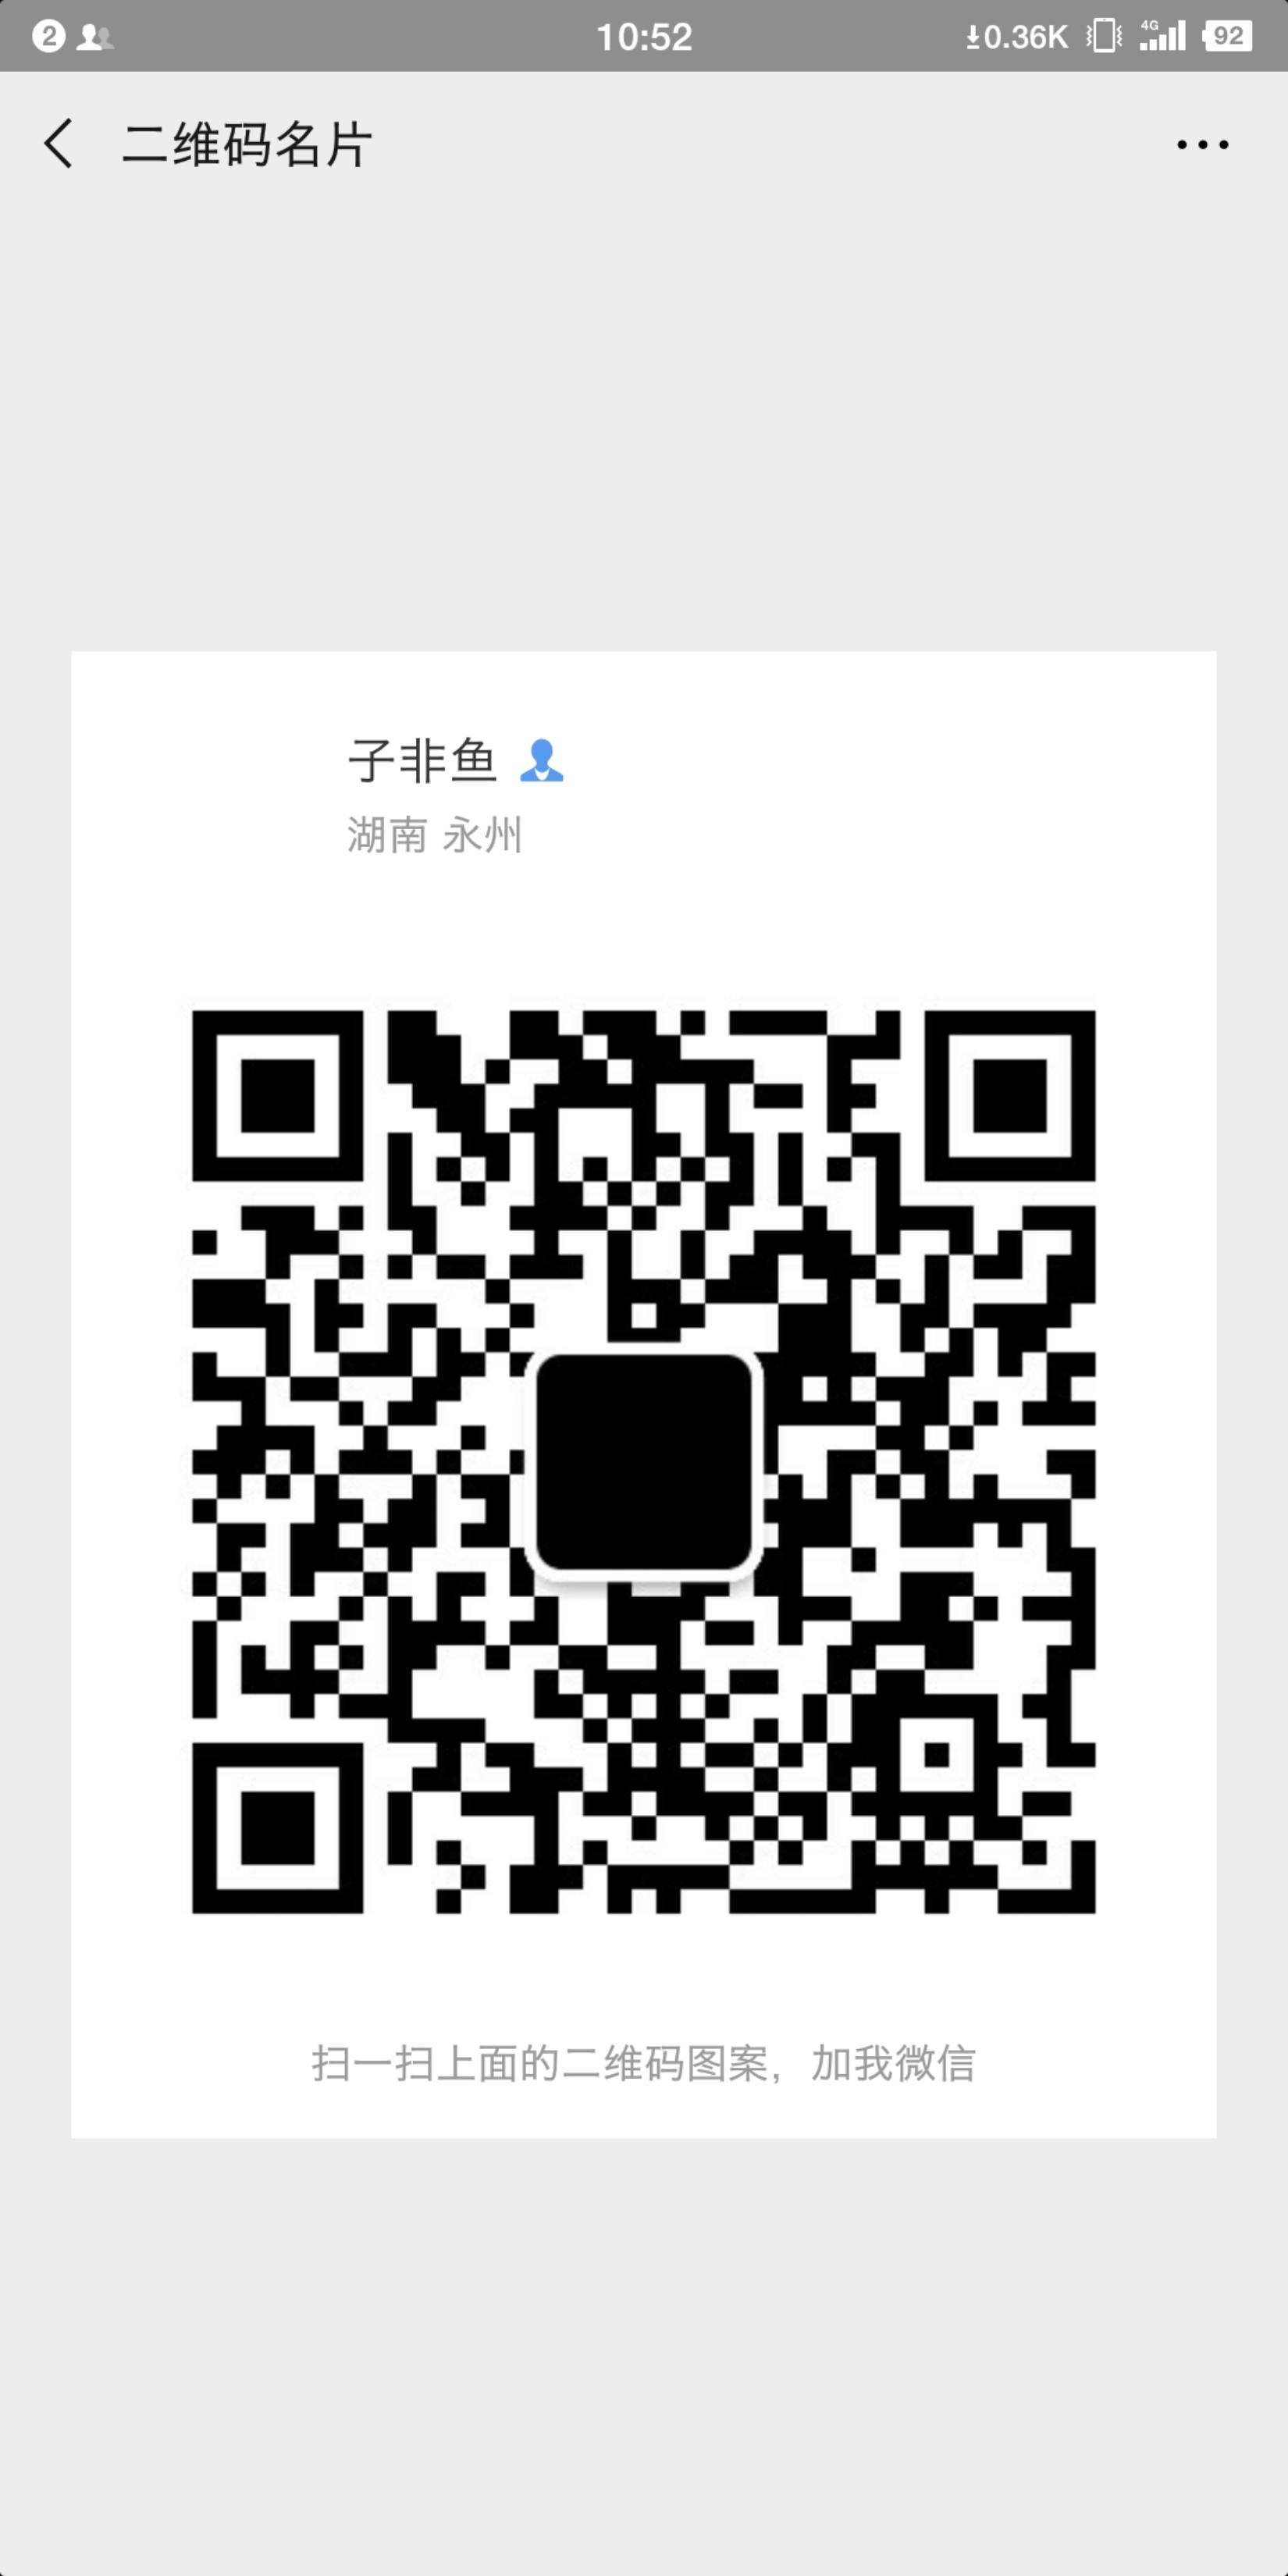 Screenshot_2019-01-17-10-52-29-424.png